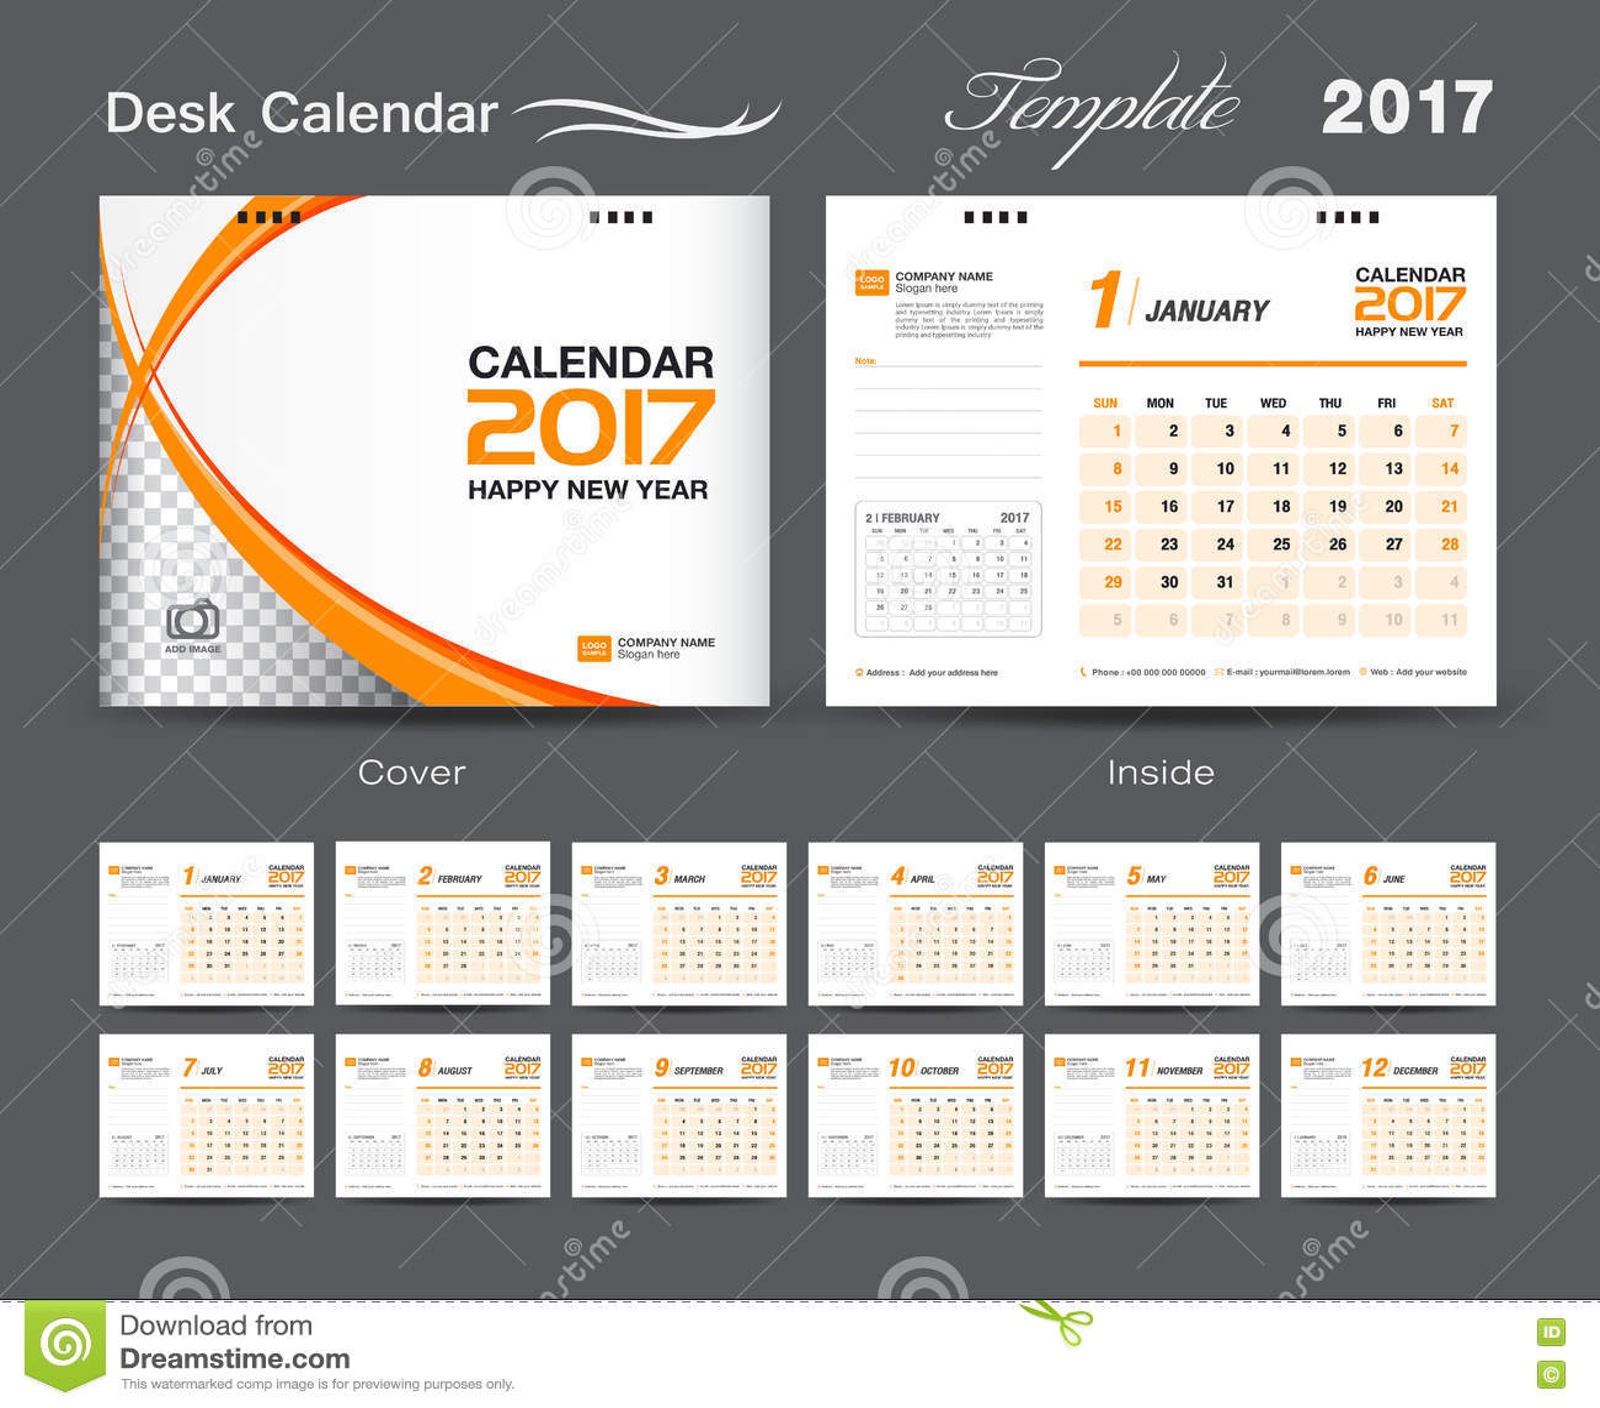 Calendar Typography Template : Set white and orange desk calendar template design